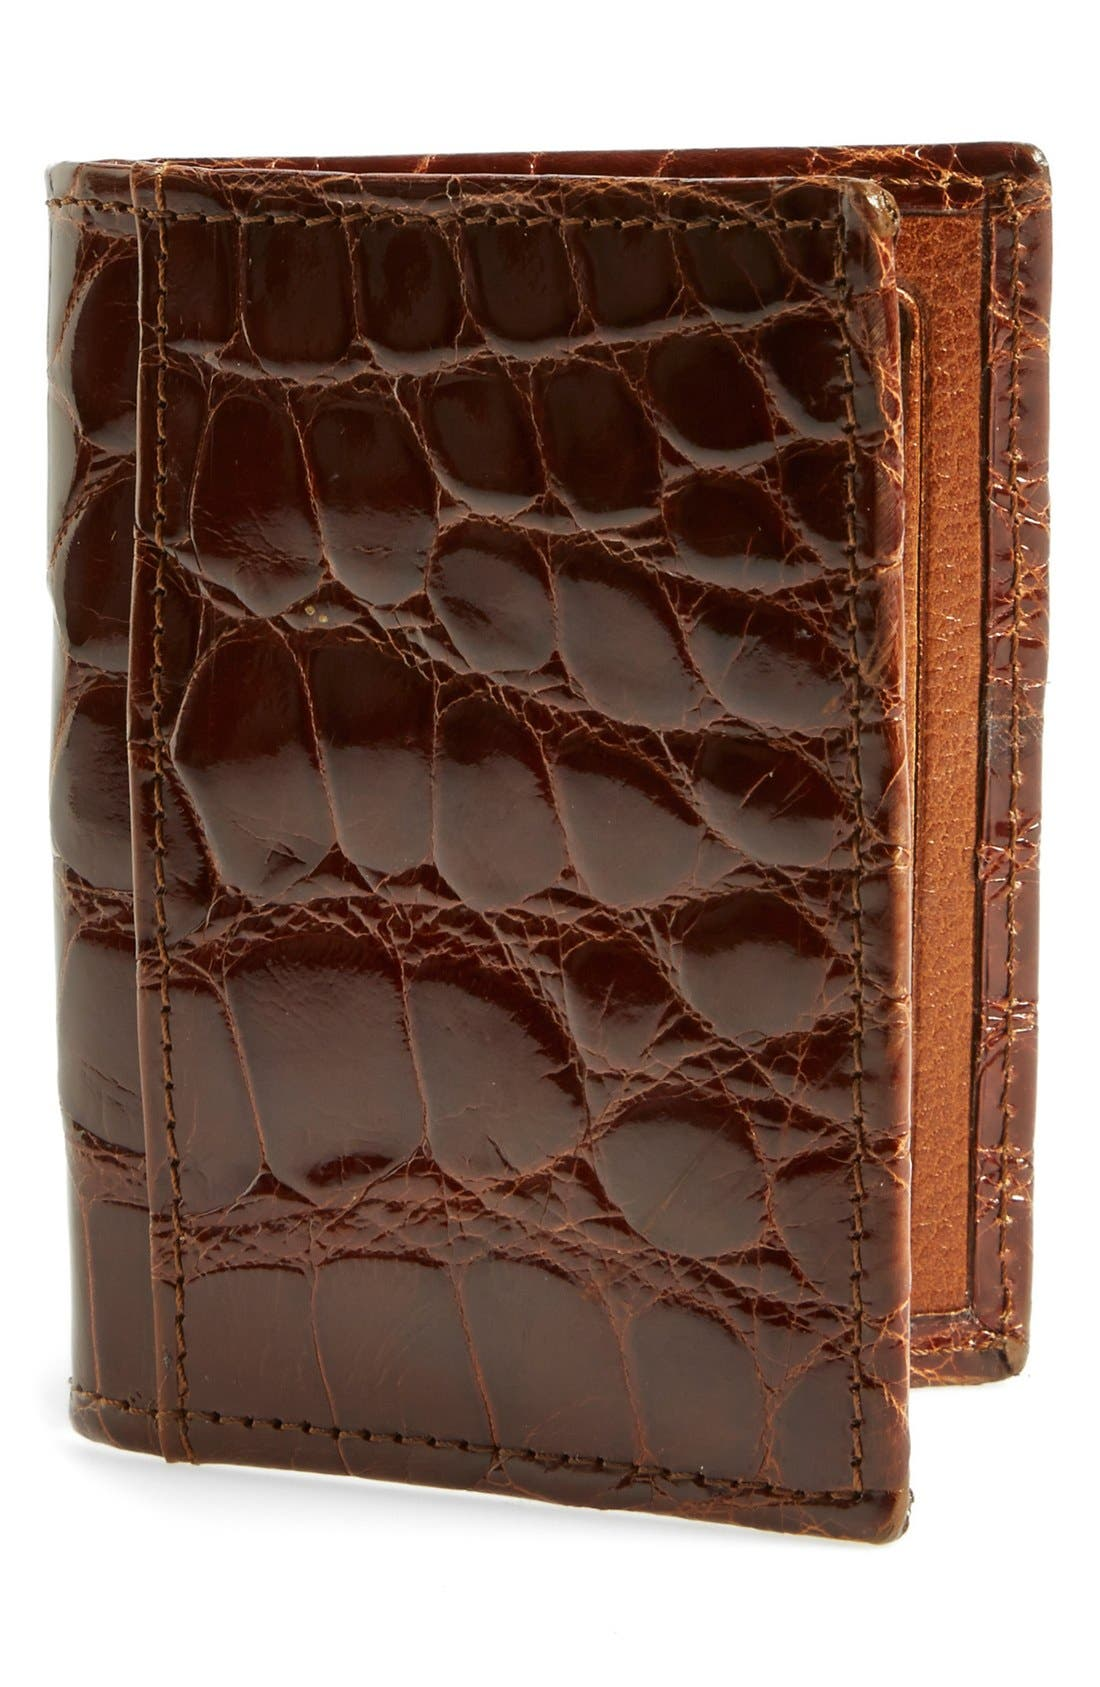 Martin Dingman 'Joseph' Genuine American Alligator Leather ID Wallet